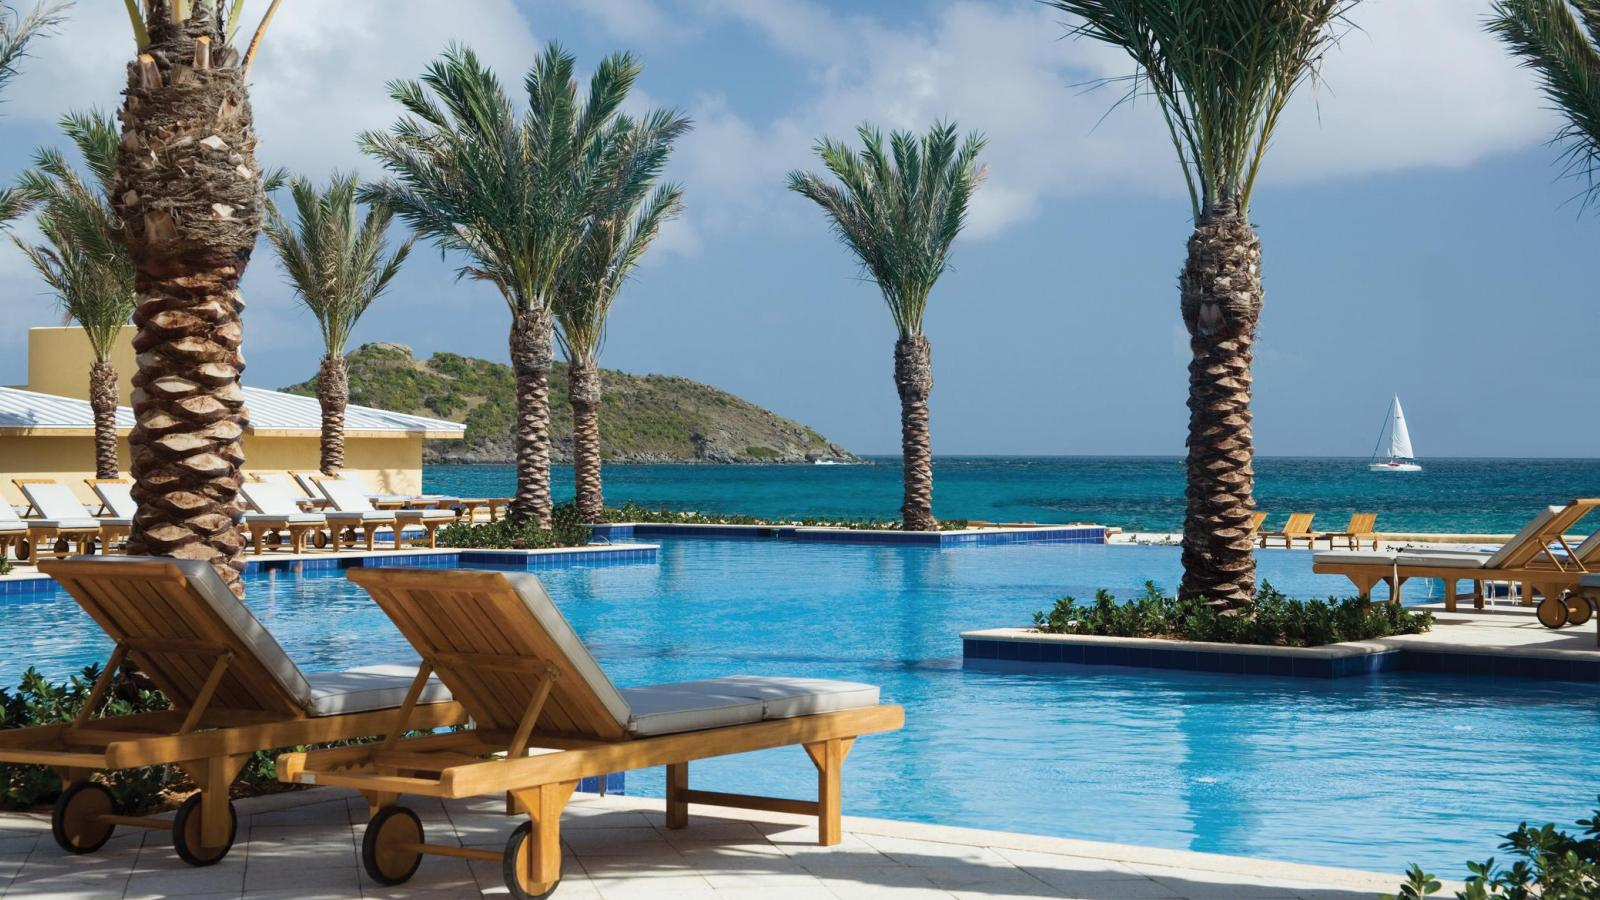 Westin Beach Resort And Spa St Maarten